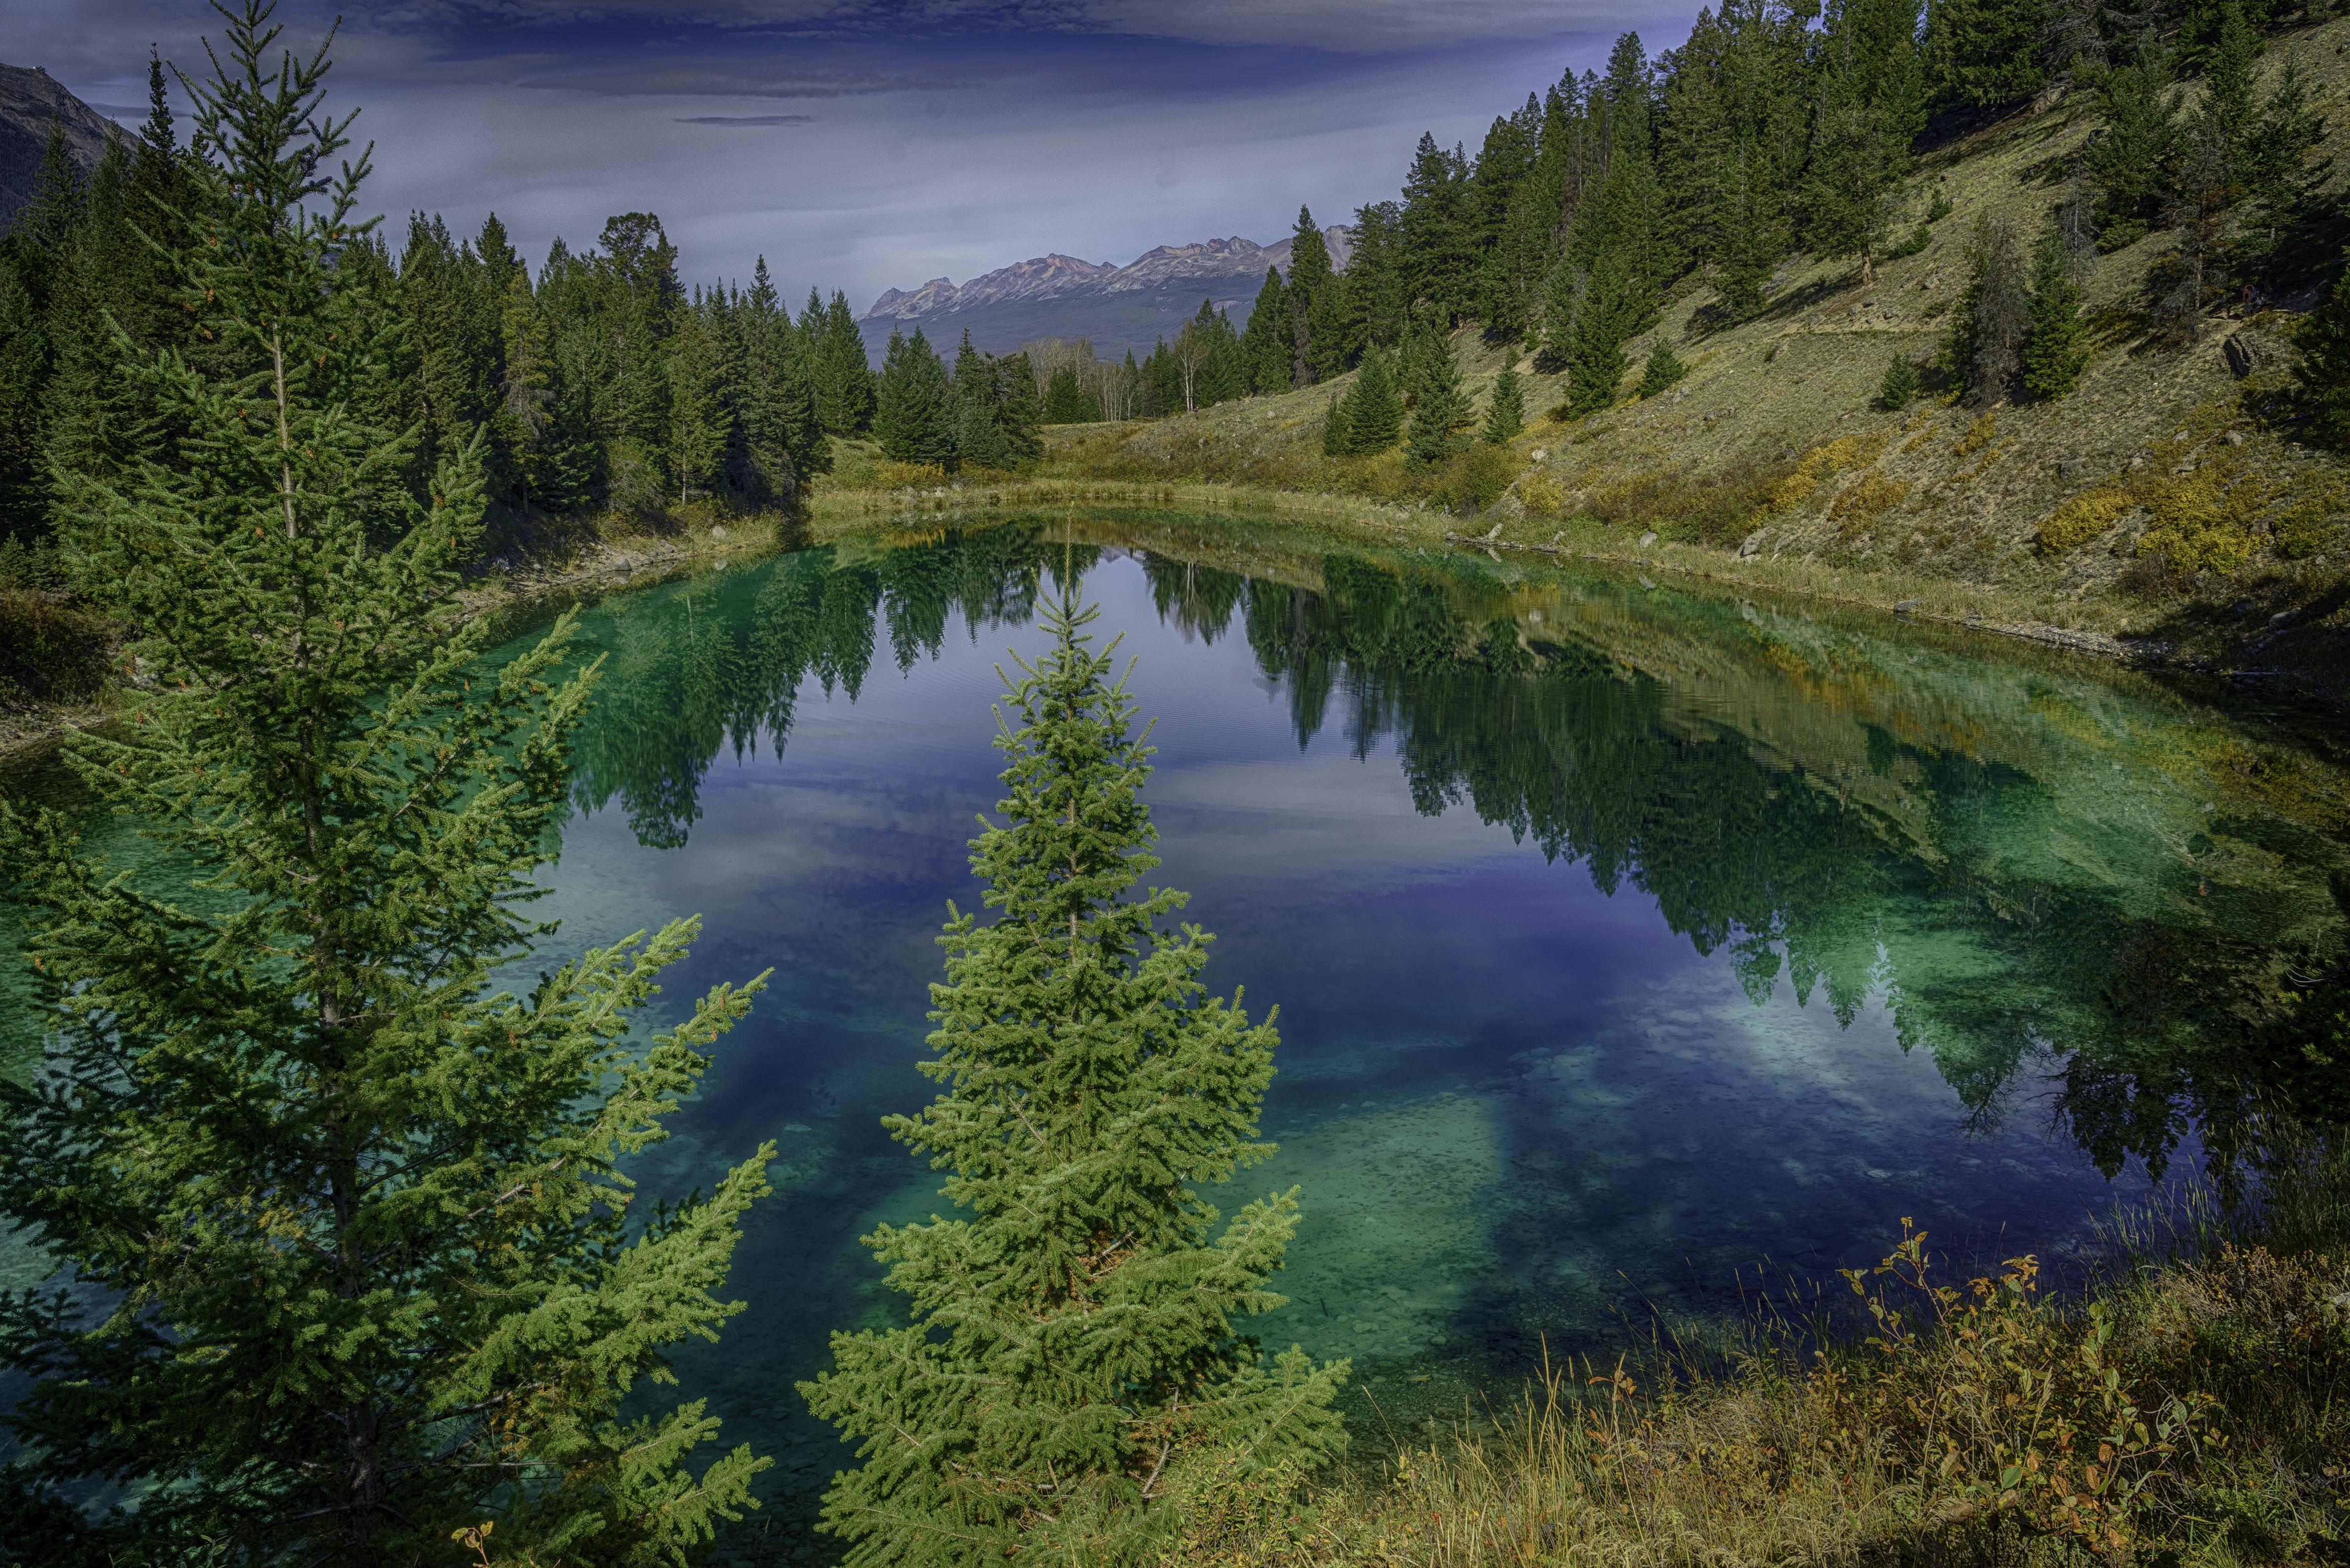 Valley of 5 Lakes, Alberta, Canada